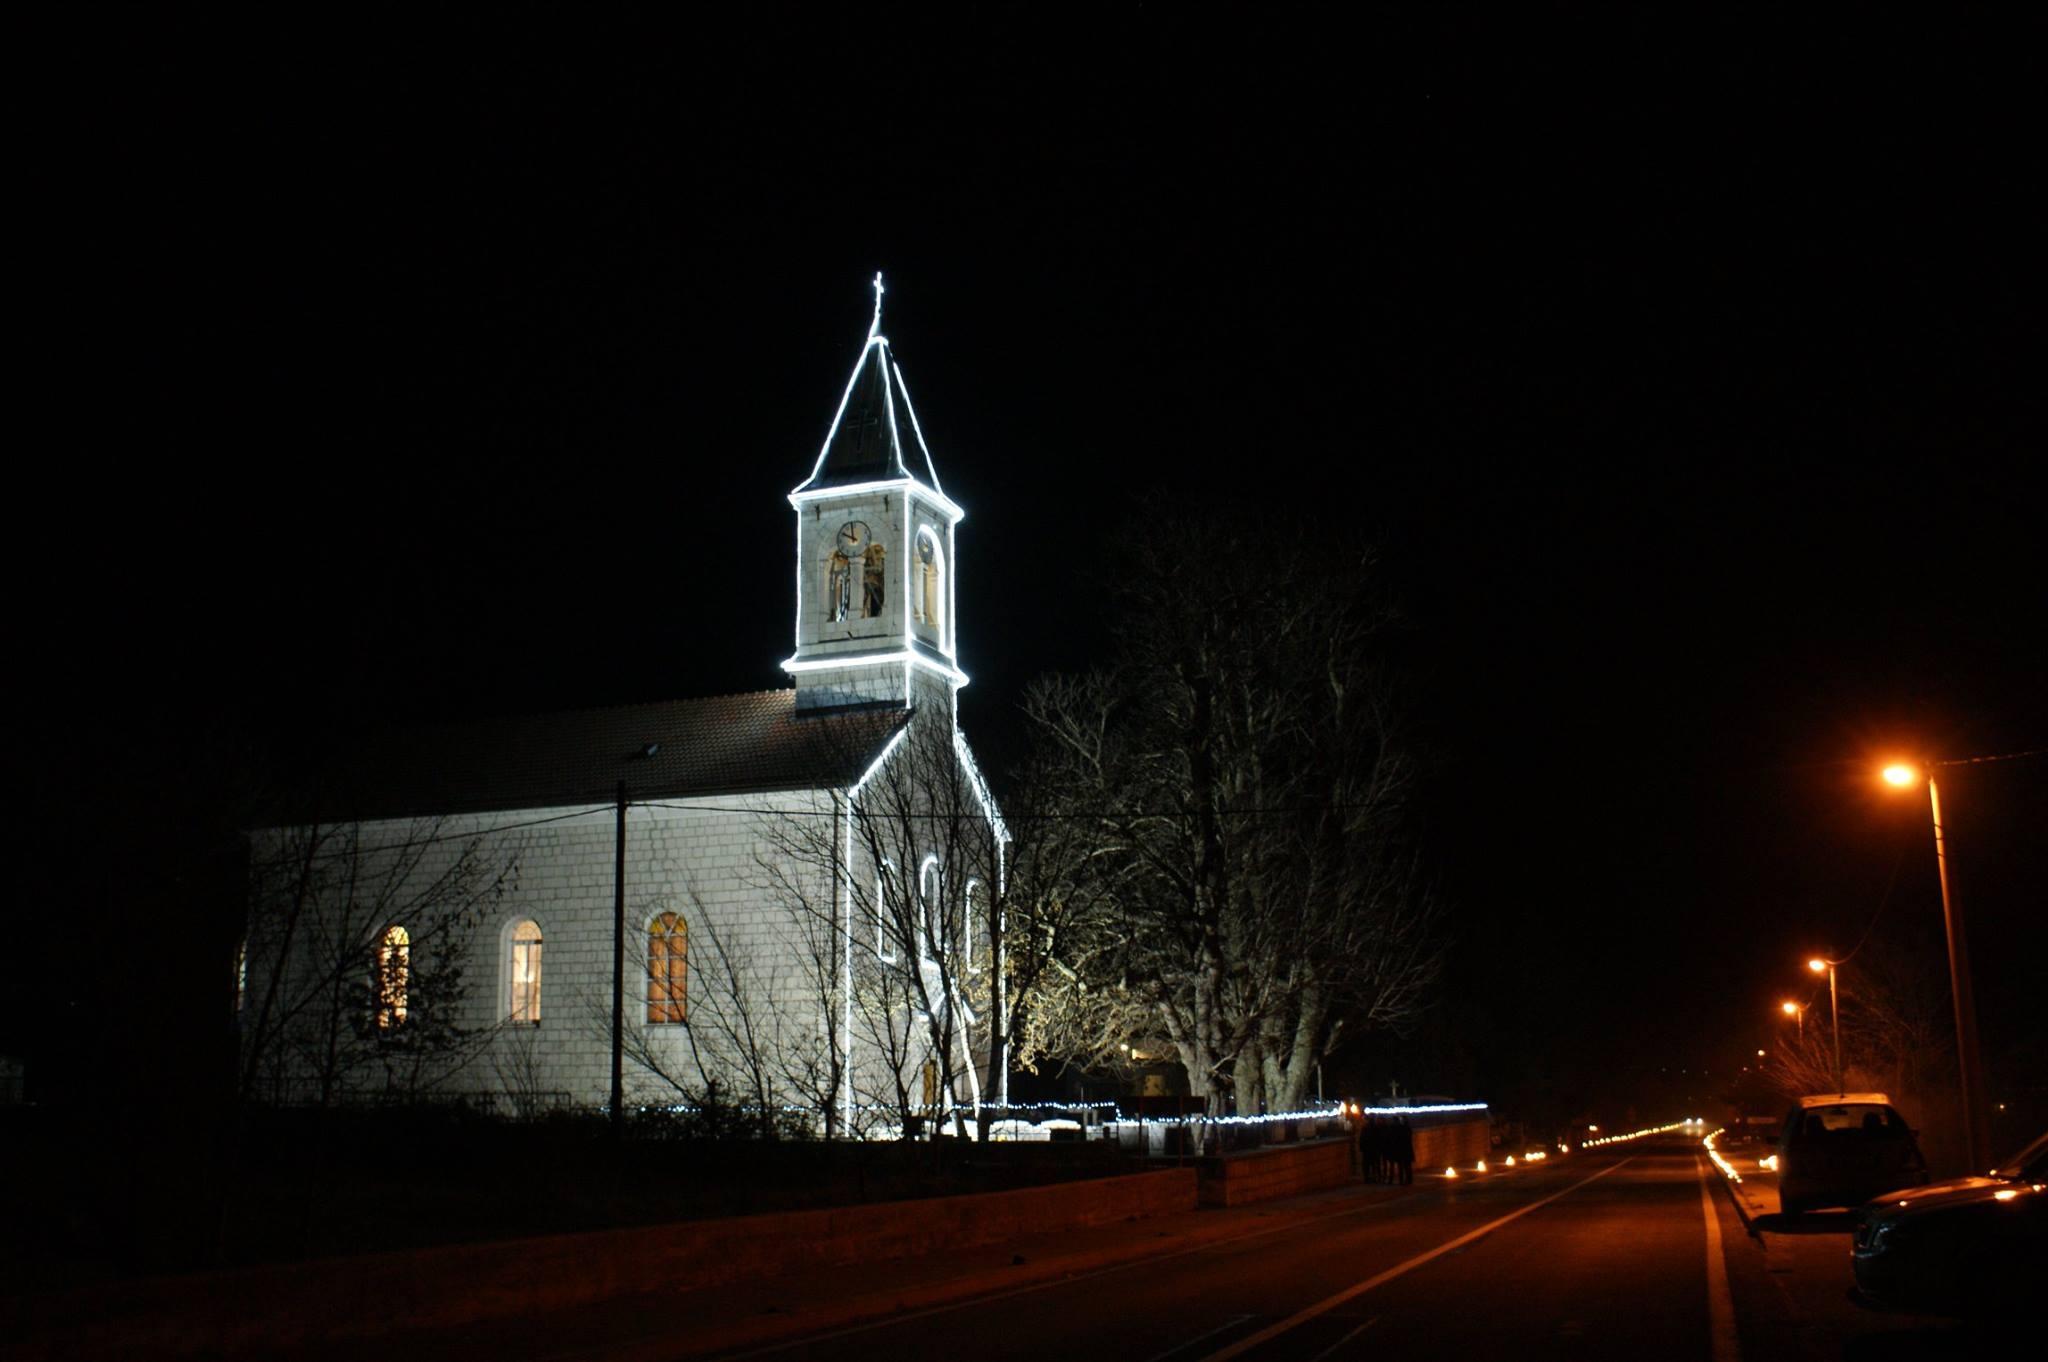 Crkva sv. Jakova, Cista Velika, Foto: Frane Rojnica